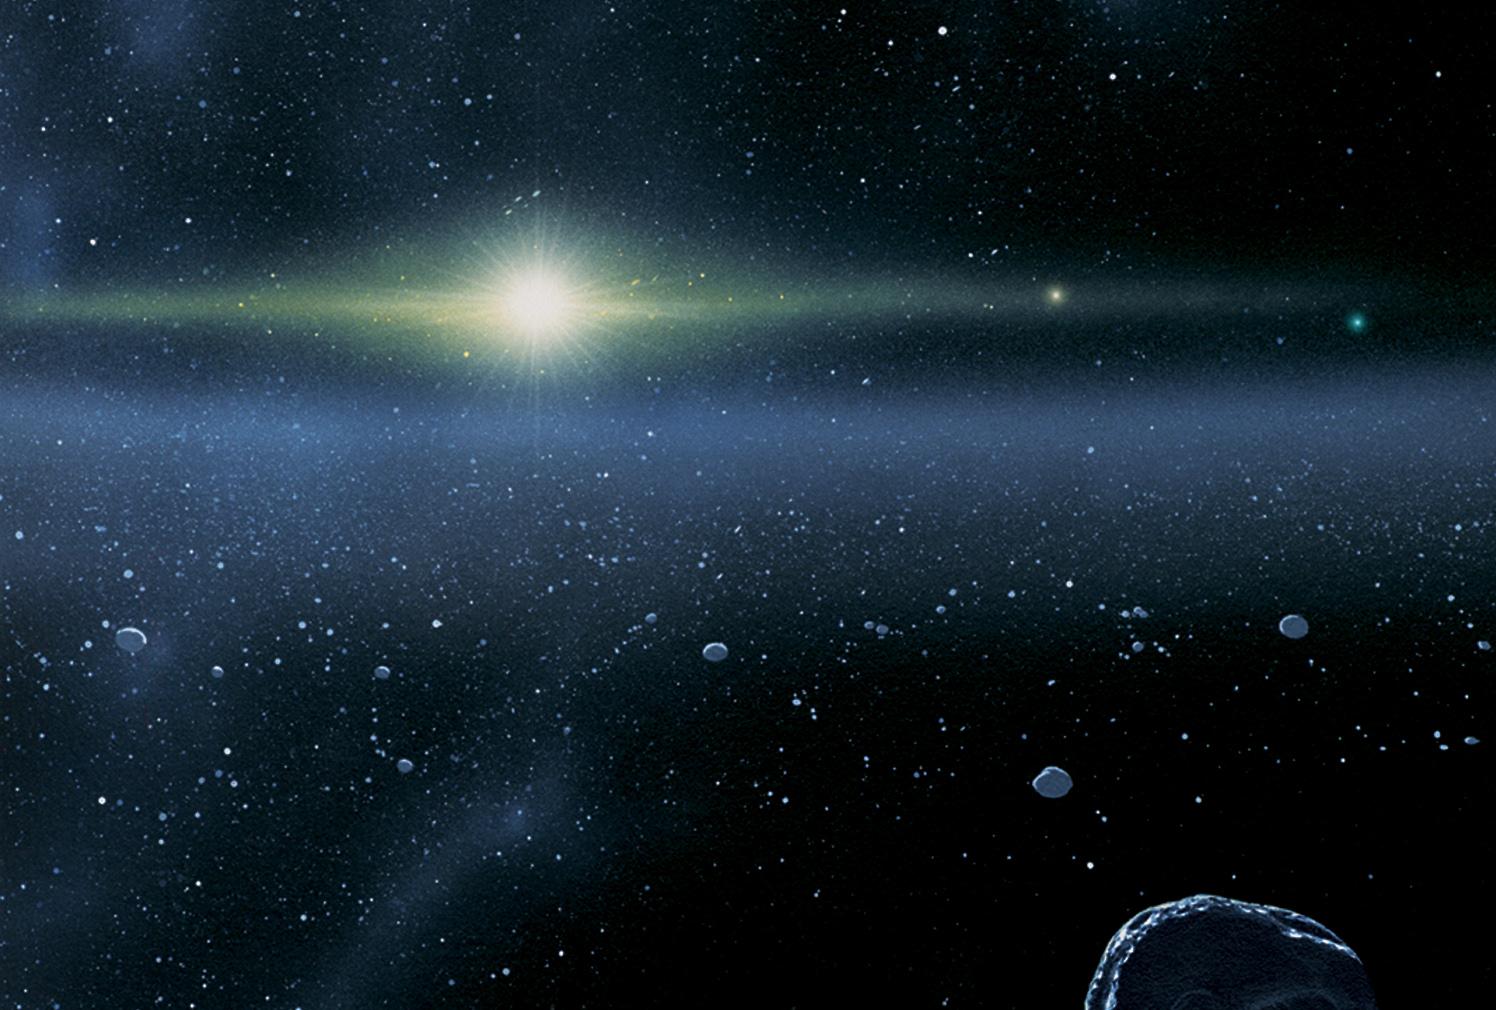 Vành đai Kuiper. Hình minh họa bởi Johns Hopkins University Applied Physics Laboratory/Southwest Research Institute (JHUAPL/SwRI).